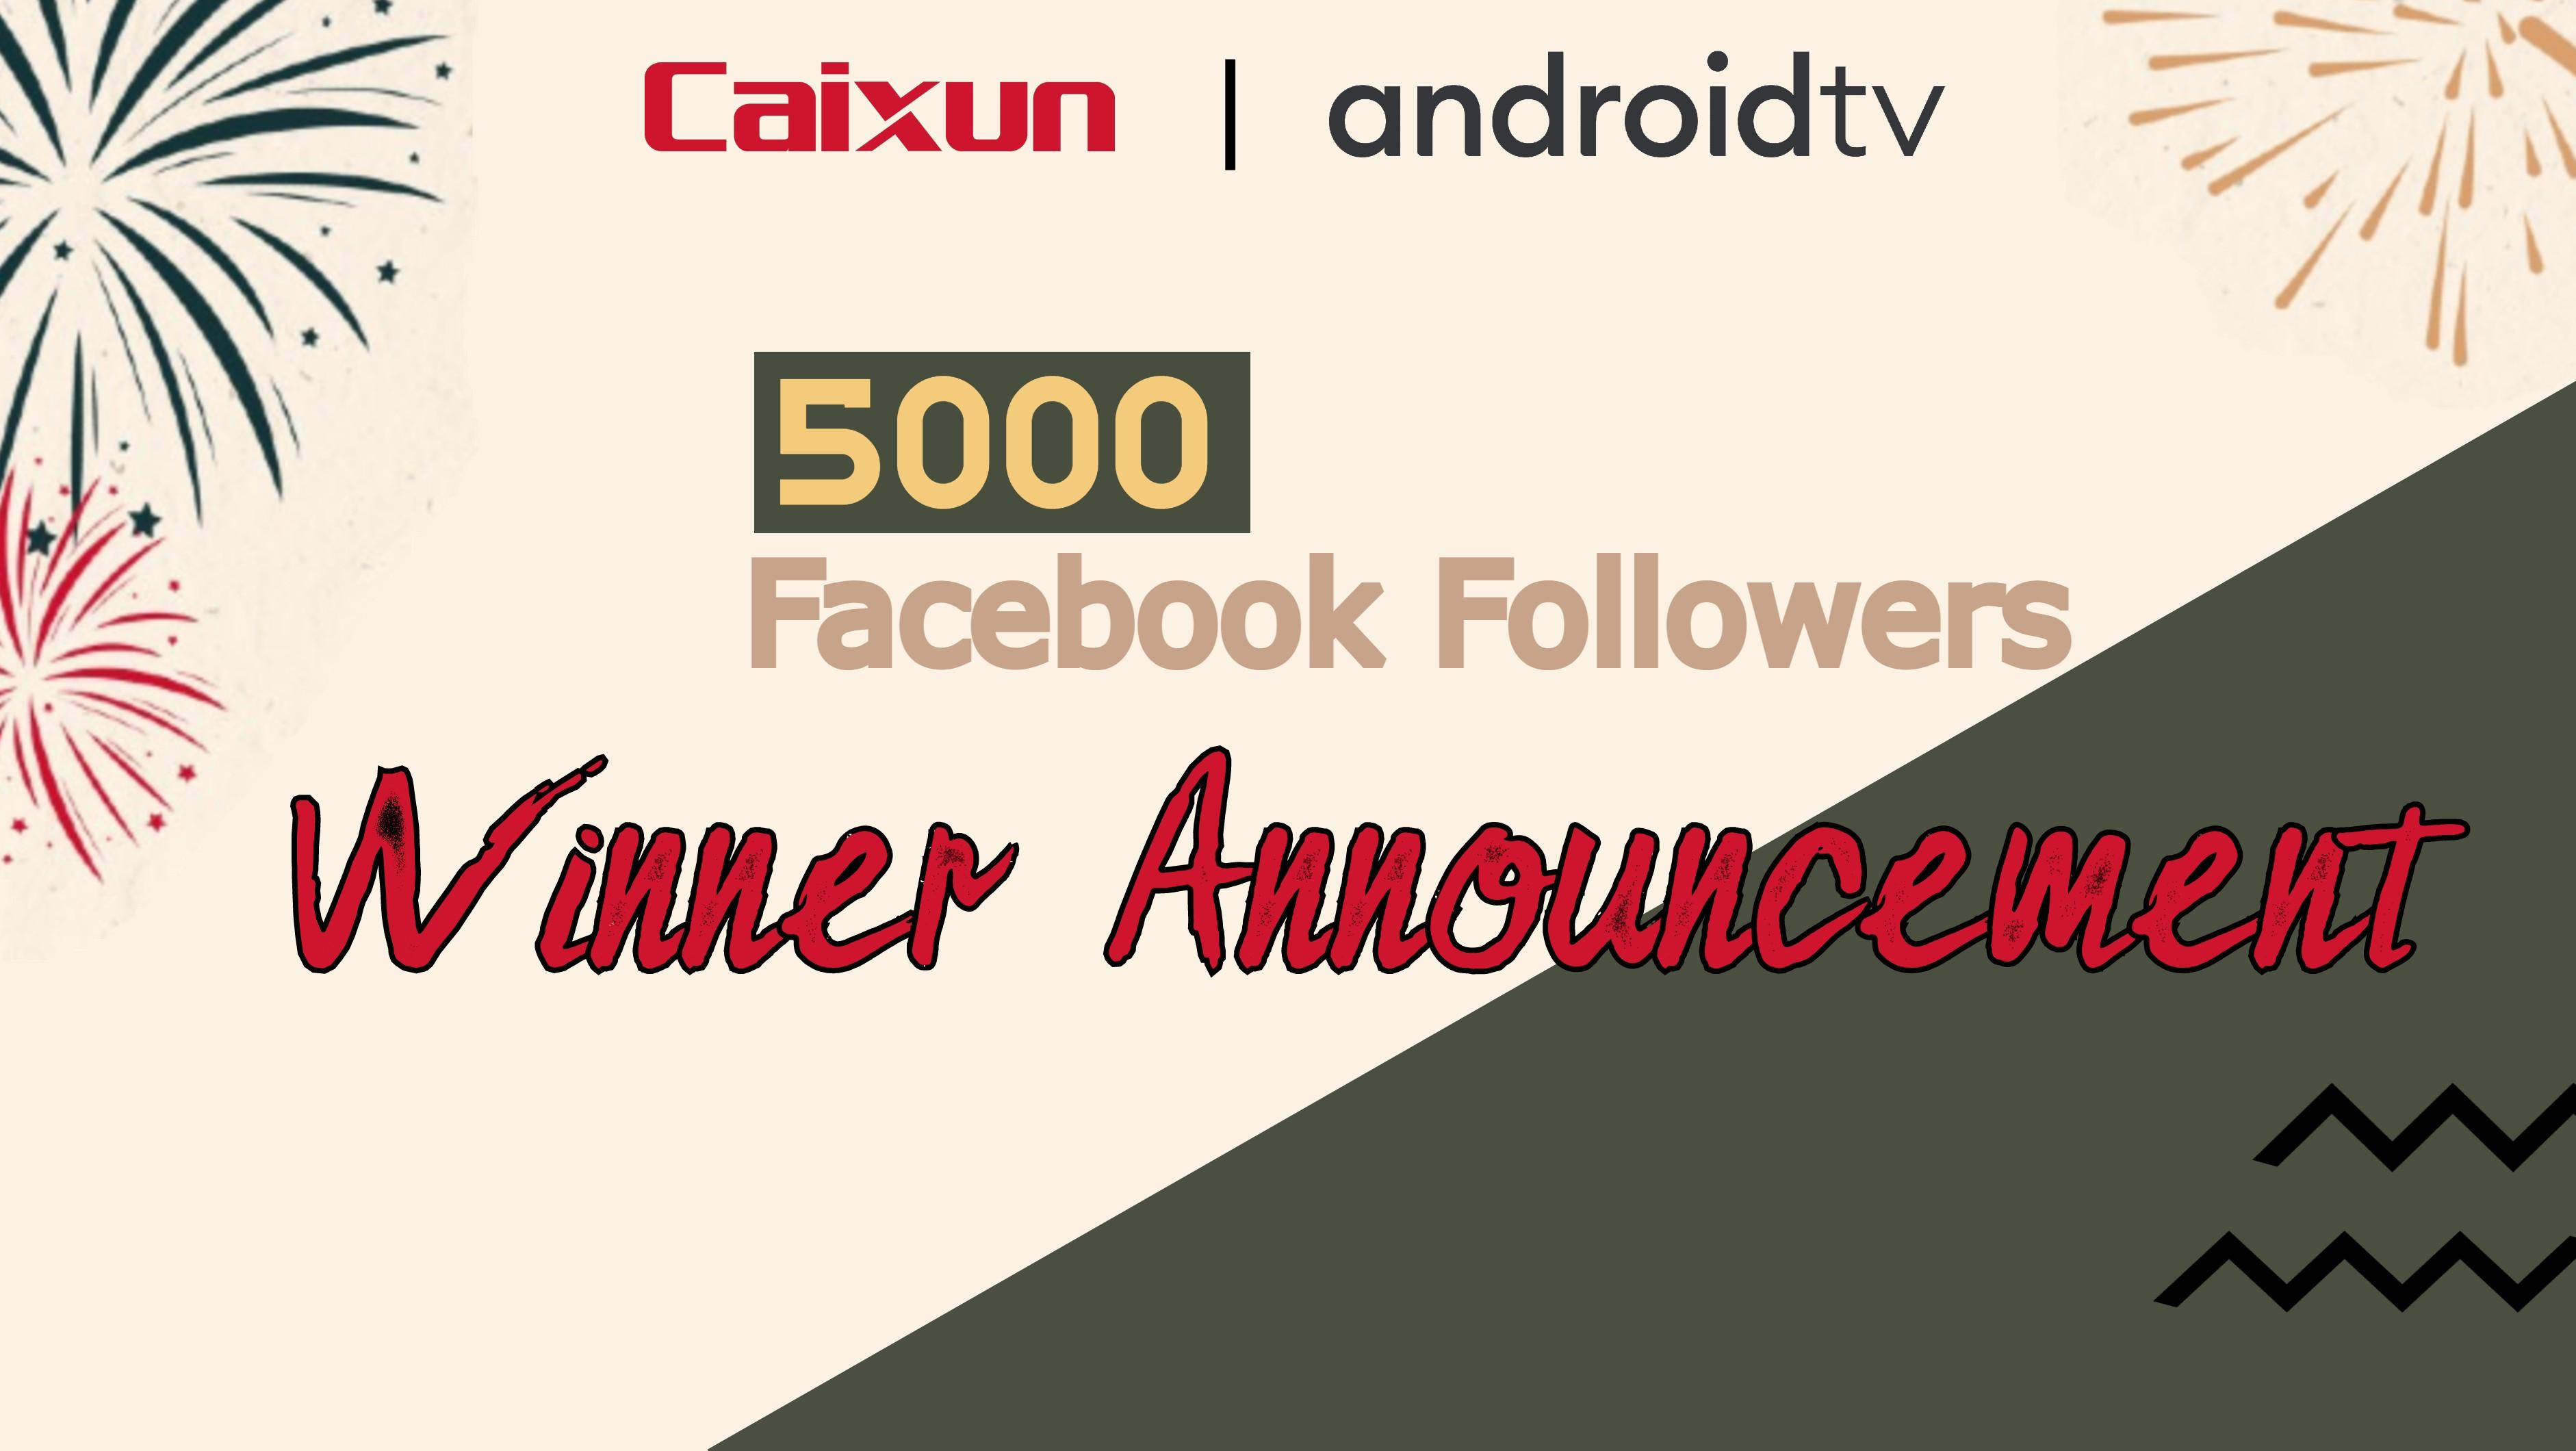 Caixun Malaysia 5K Facebook Followers Giveaway Campaign 2021 : Winner Announcement